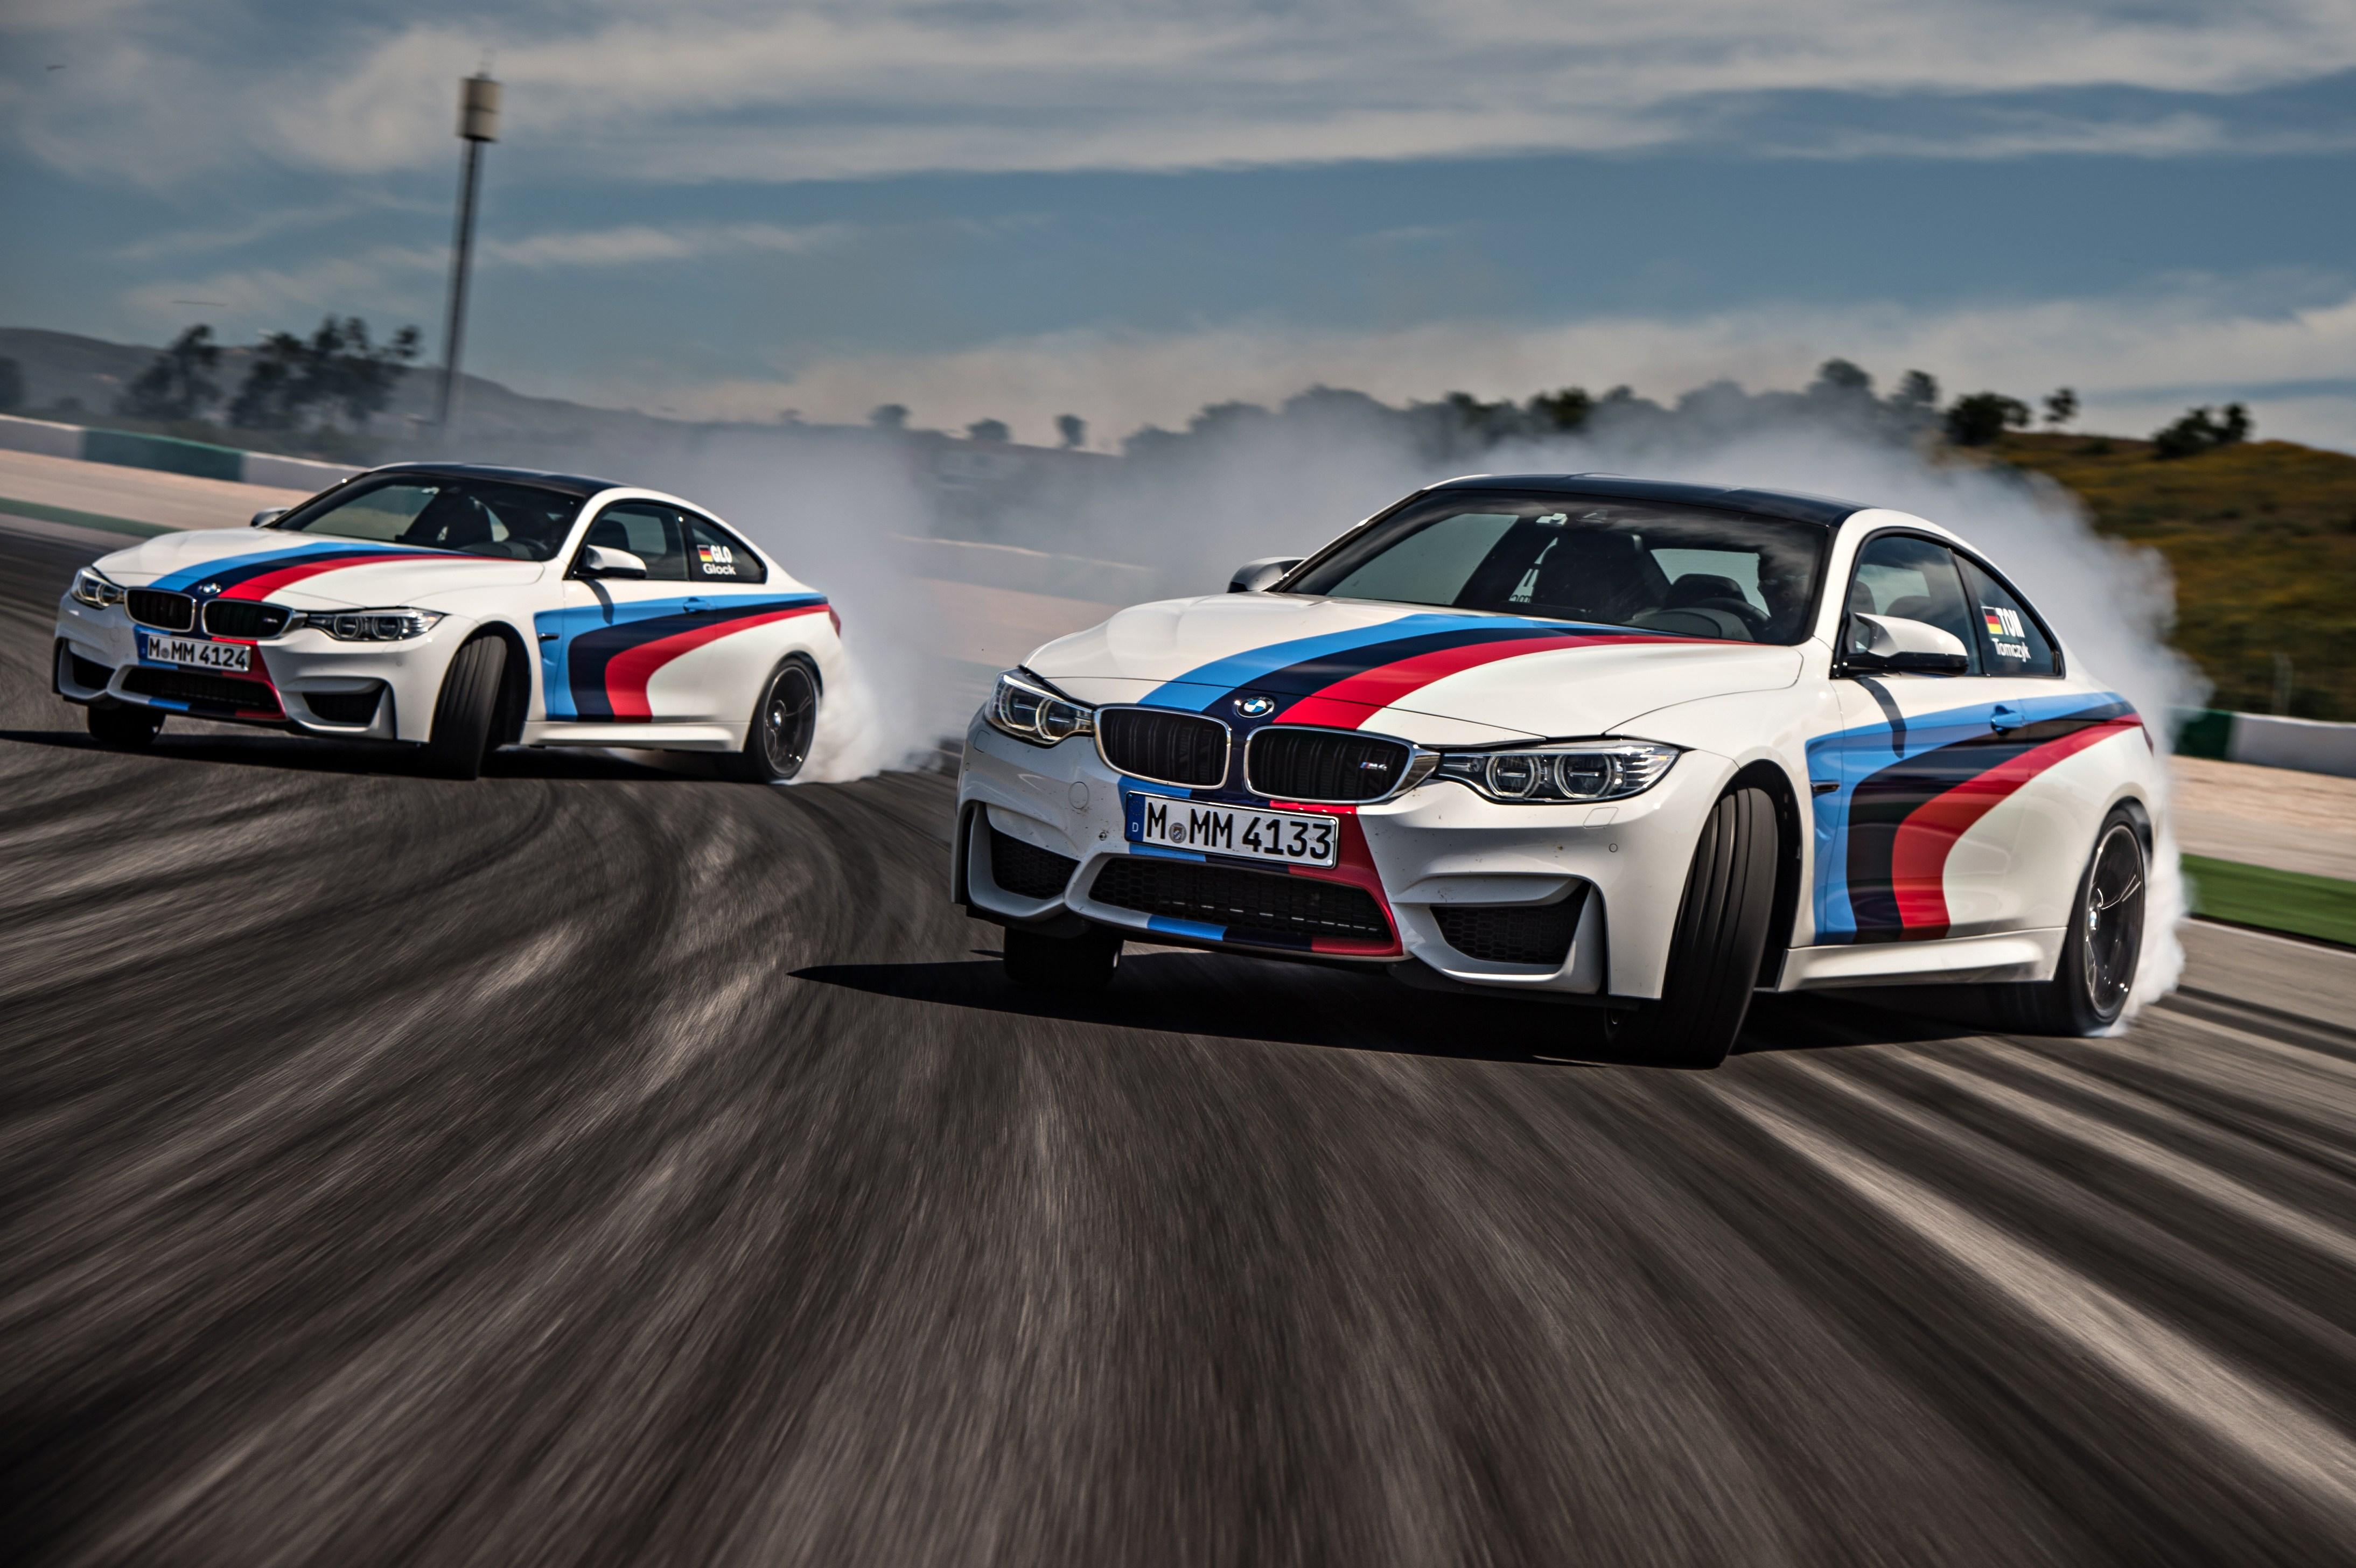 94+ Drifting BMW Wallpapers on WallpaperSafari